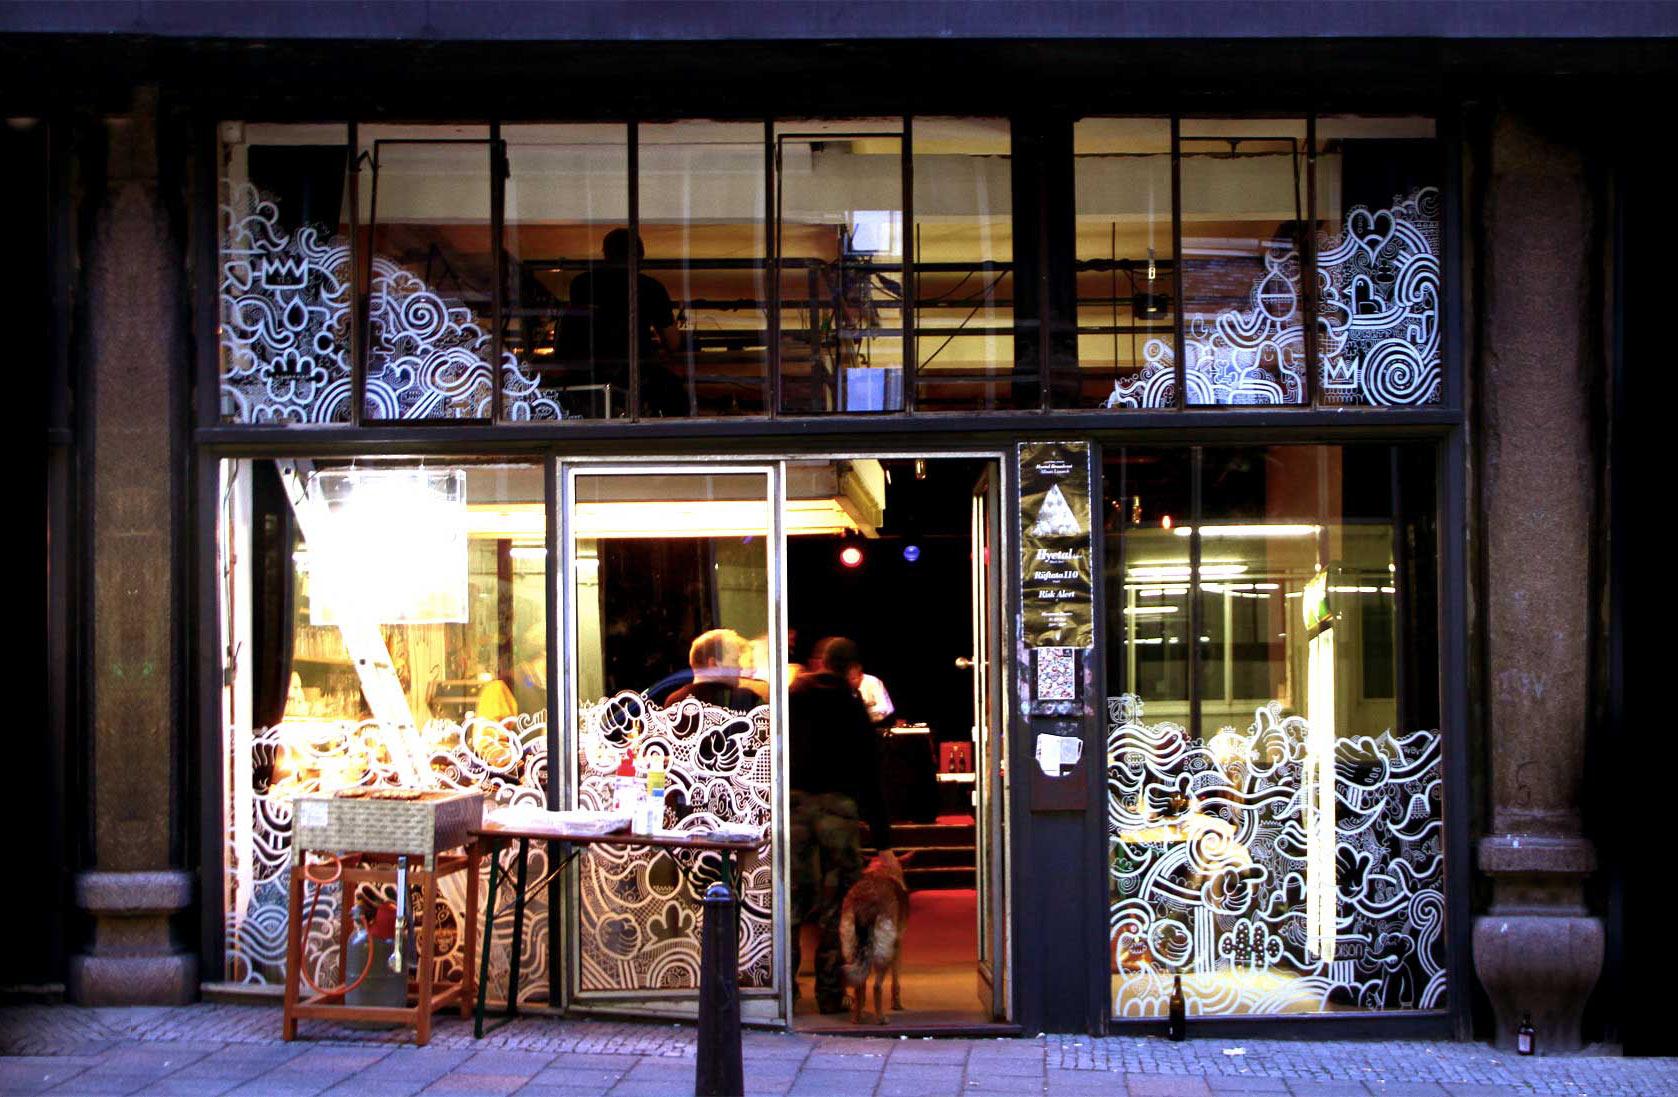 hamburg_mural_temp